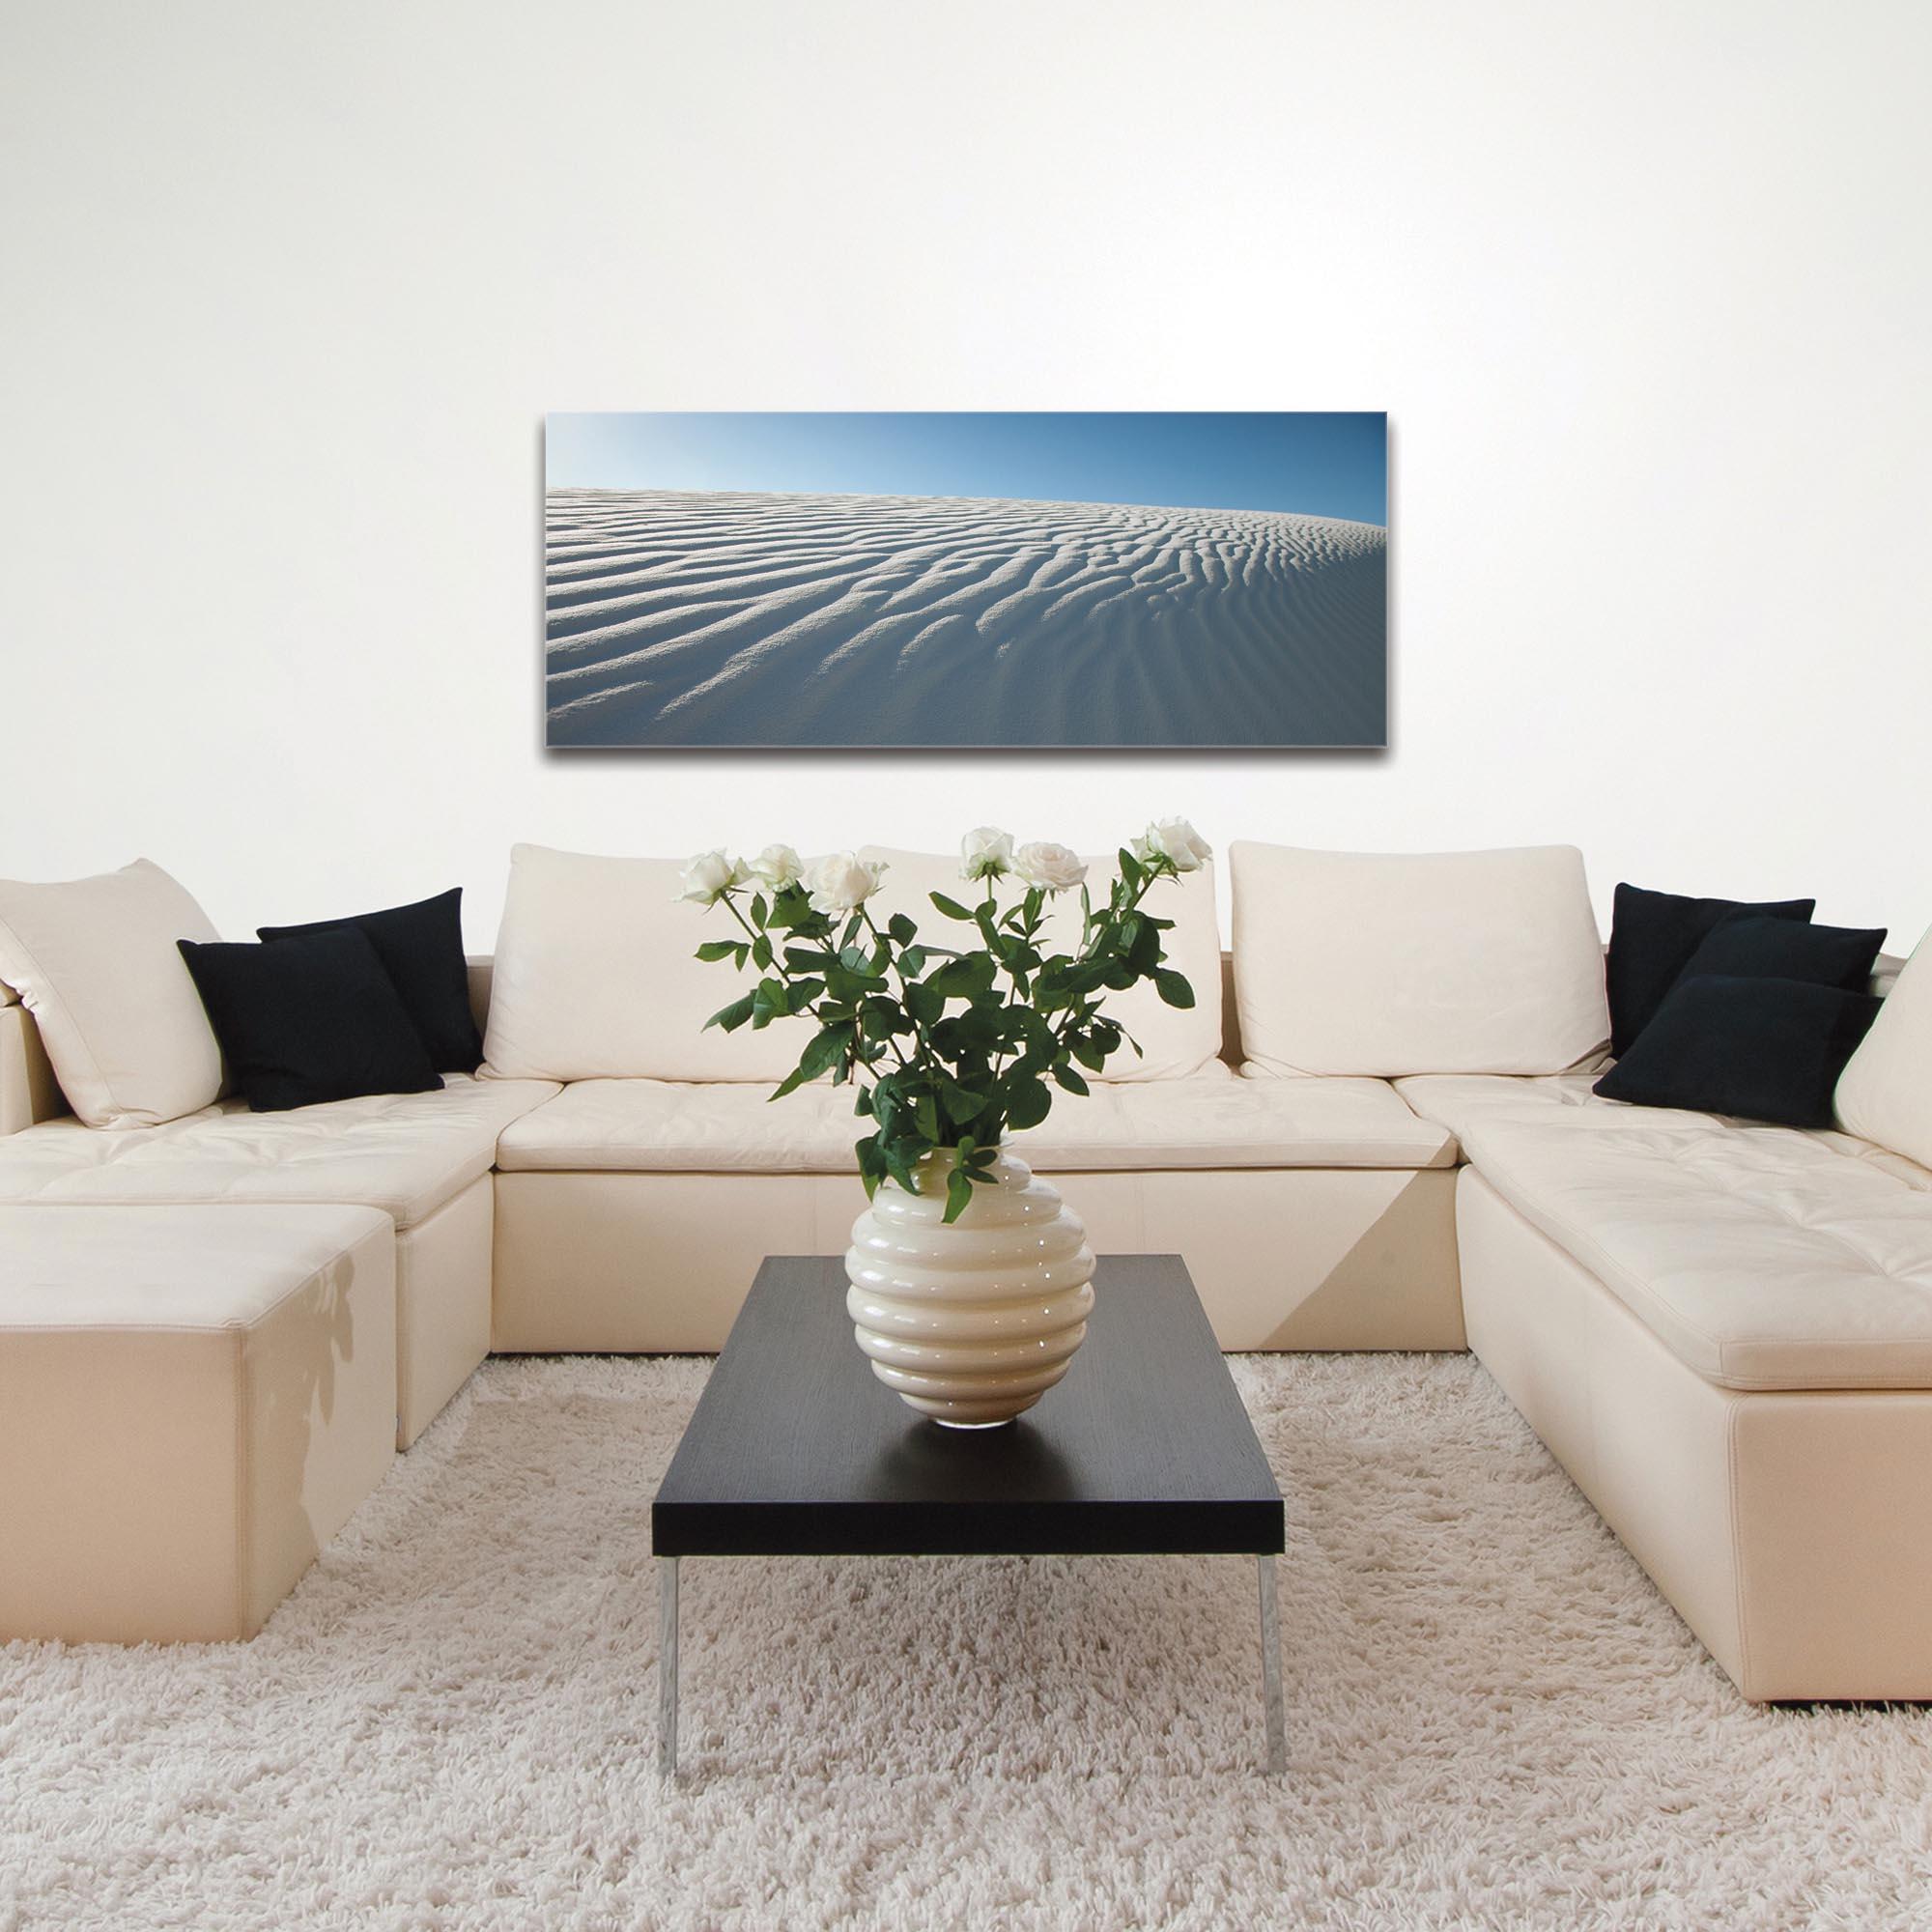 Landscape Photography 'Rippled Sand' - Sand Dunes Art on Metal or Plexiglass - Image 3